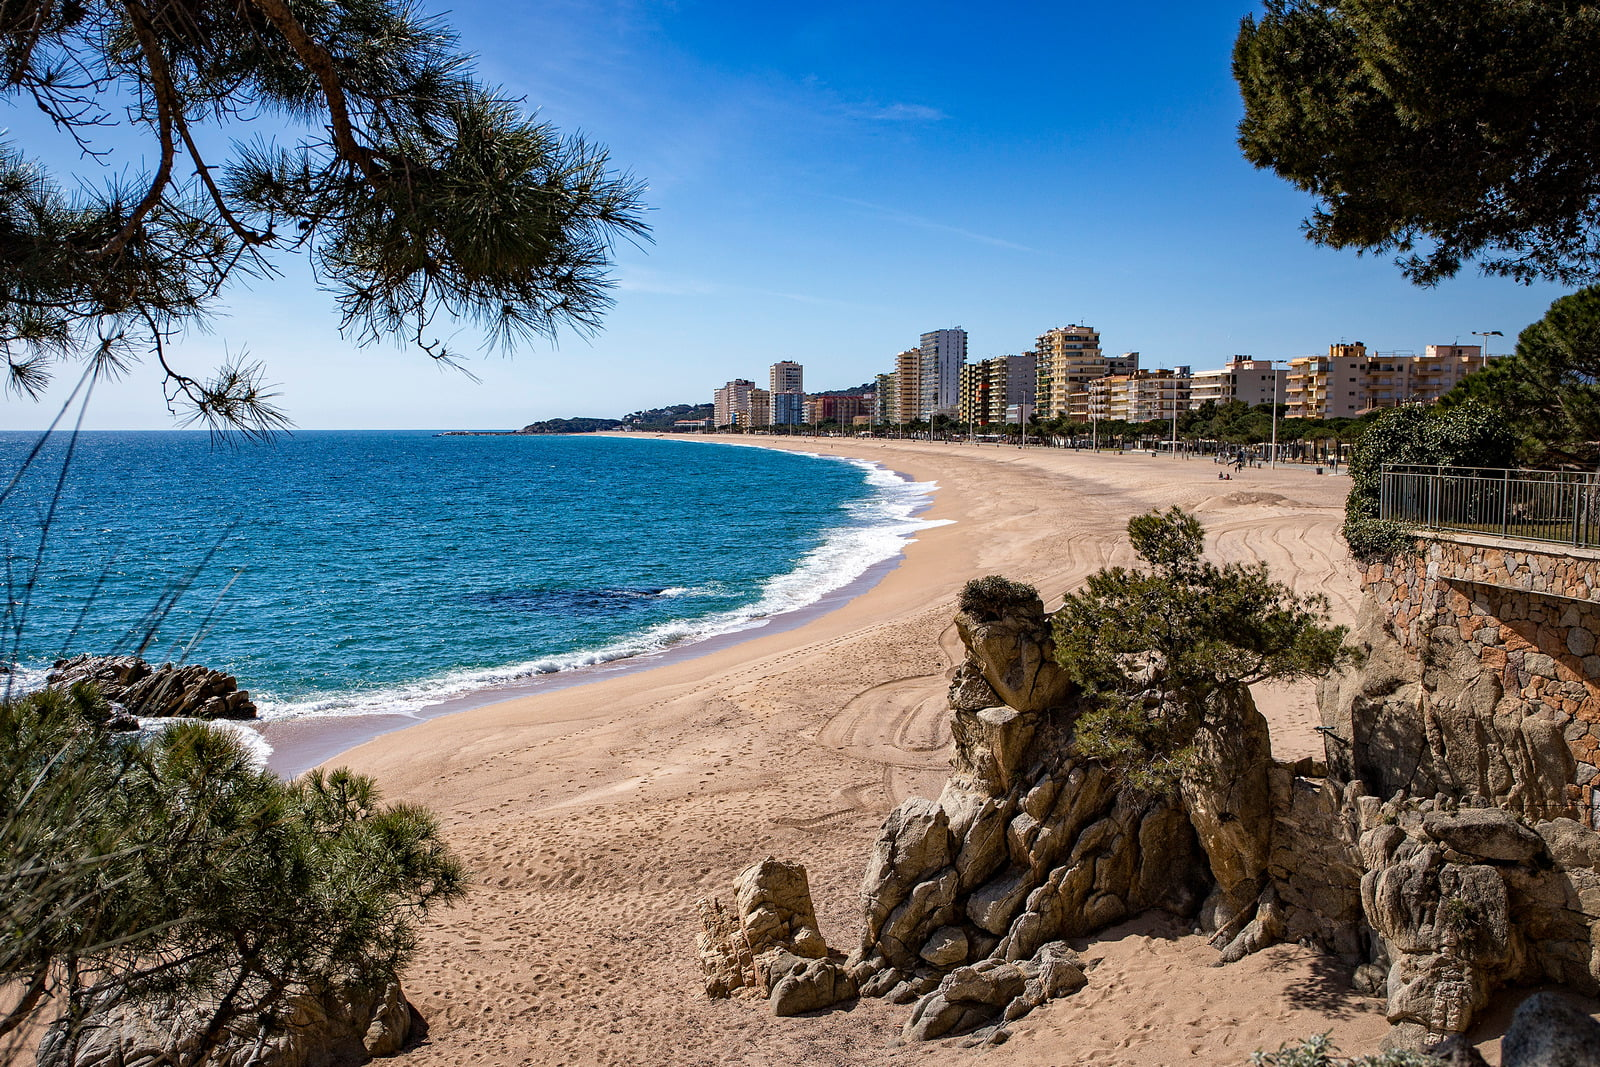 Playa de Aro, Catalonia